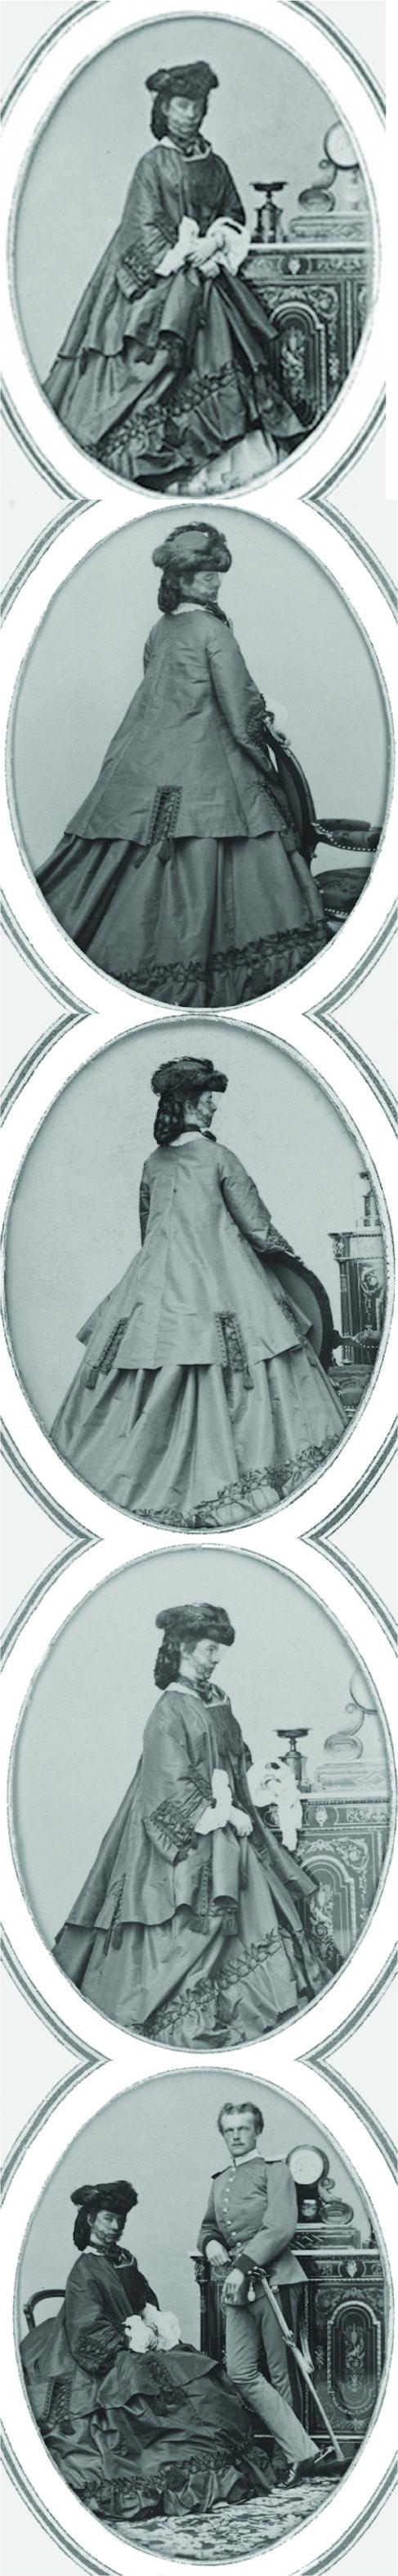 Sisi wearing dark dress set - Empress Elisabeth of Austria (due to the movie also known now as Sissi, 1837-1898)